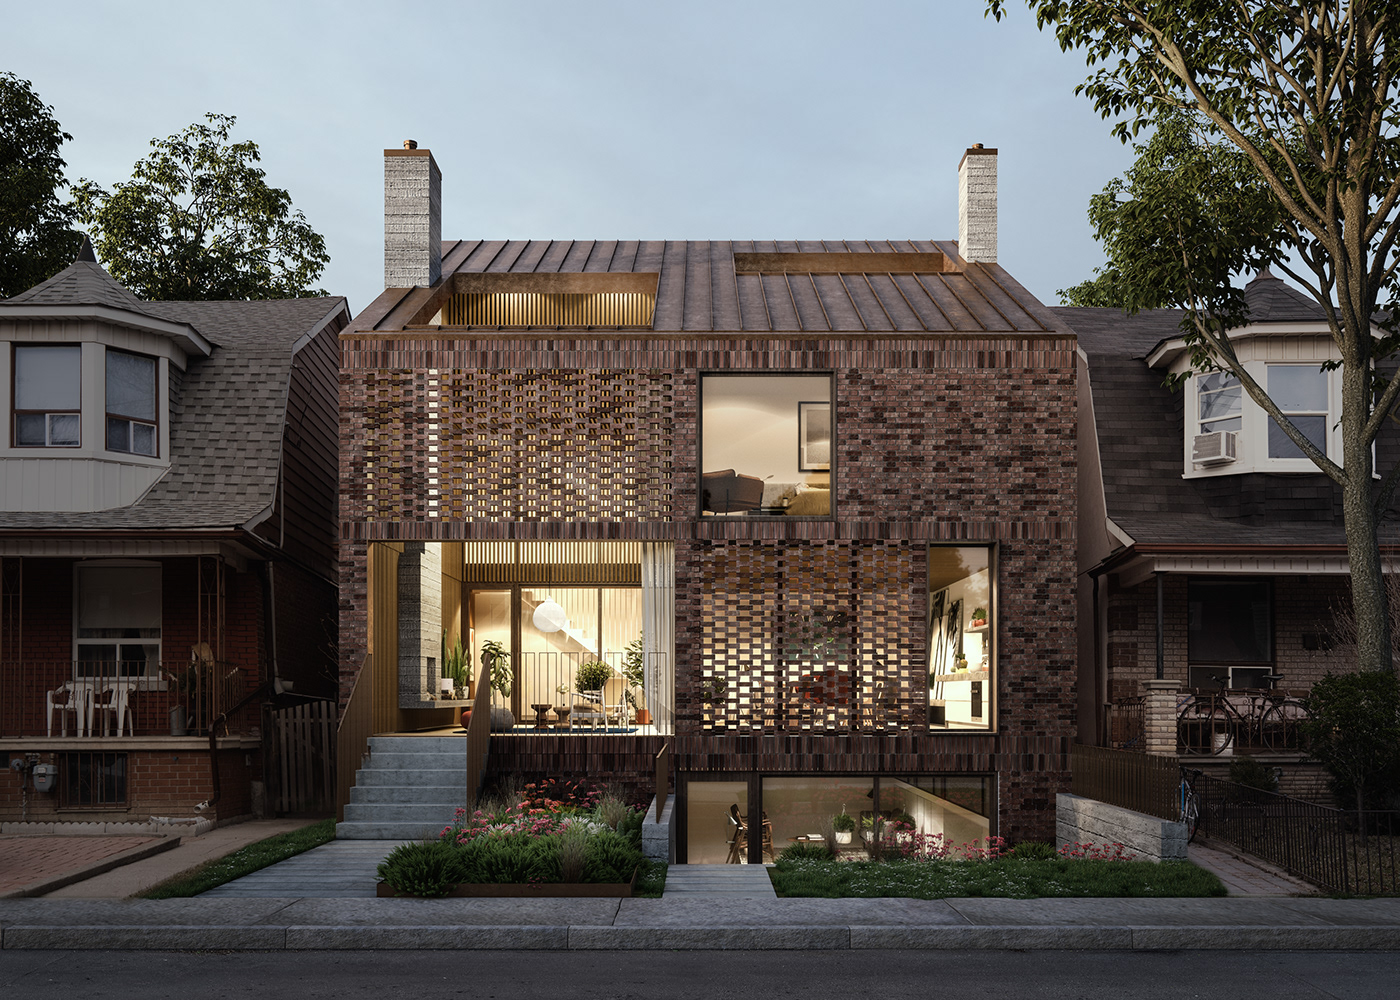 architecture rendering Render CGI real estate residential